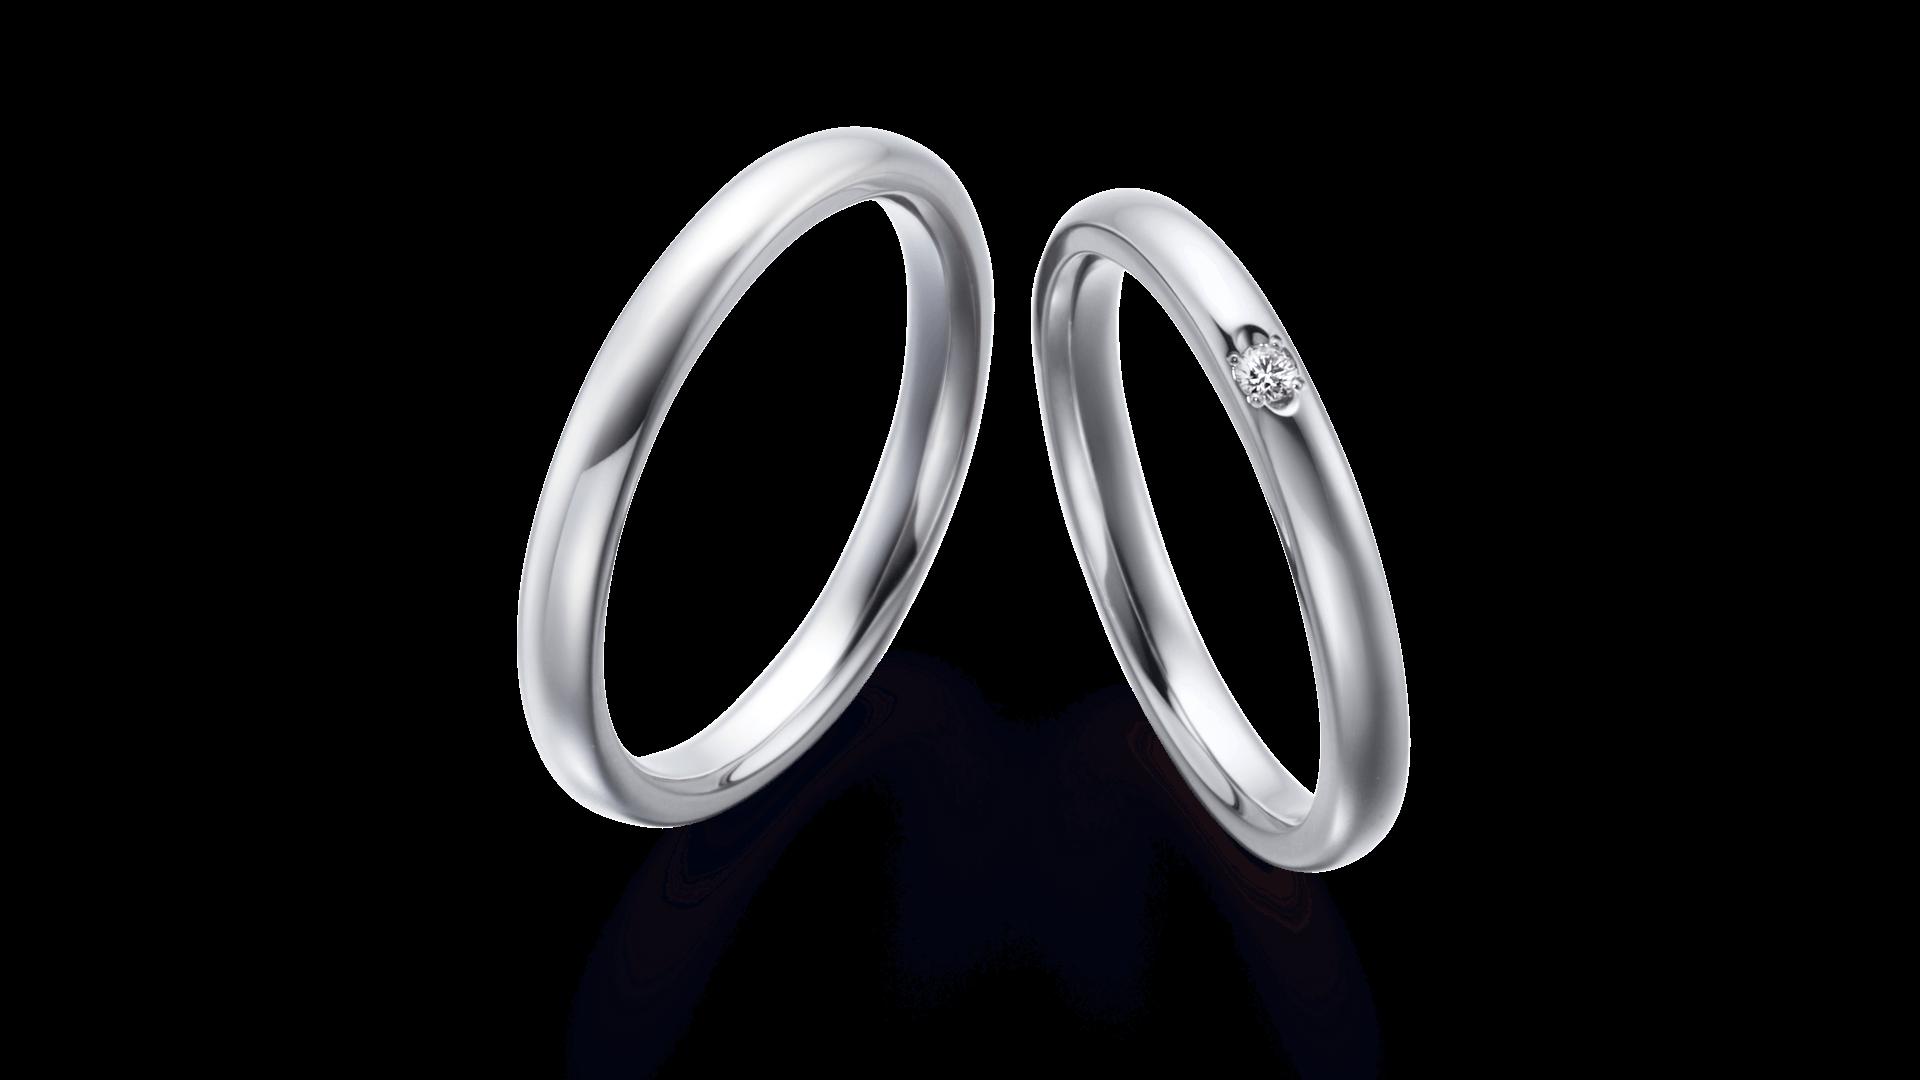 Origin Belief01 オリジンビリーフ01 | 結婚指輪サムネイル 2